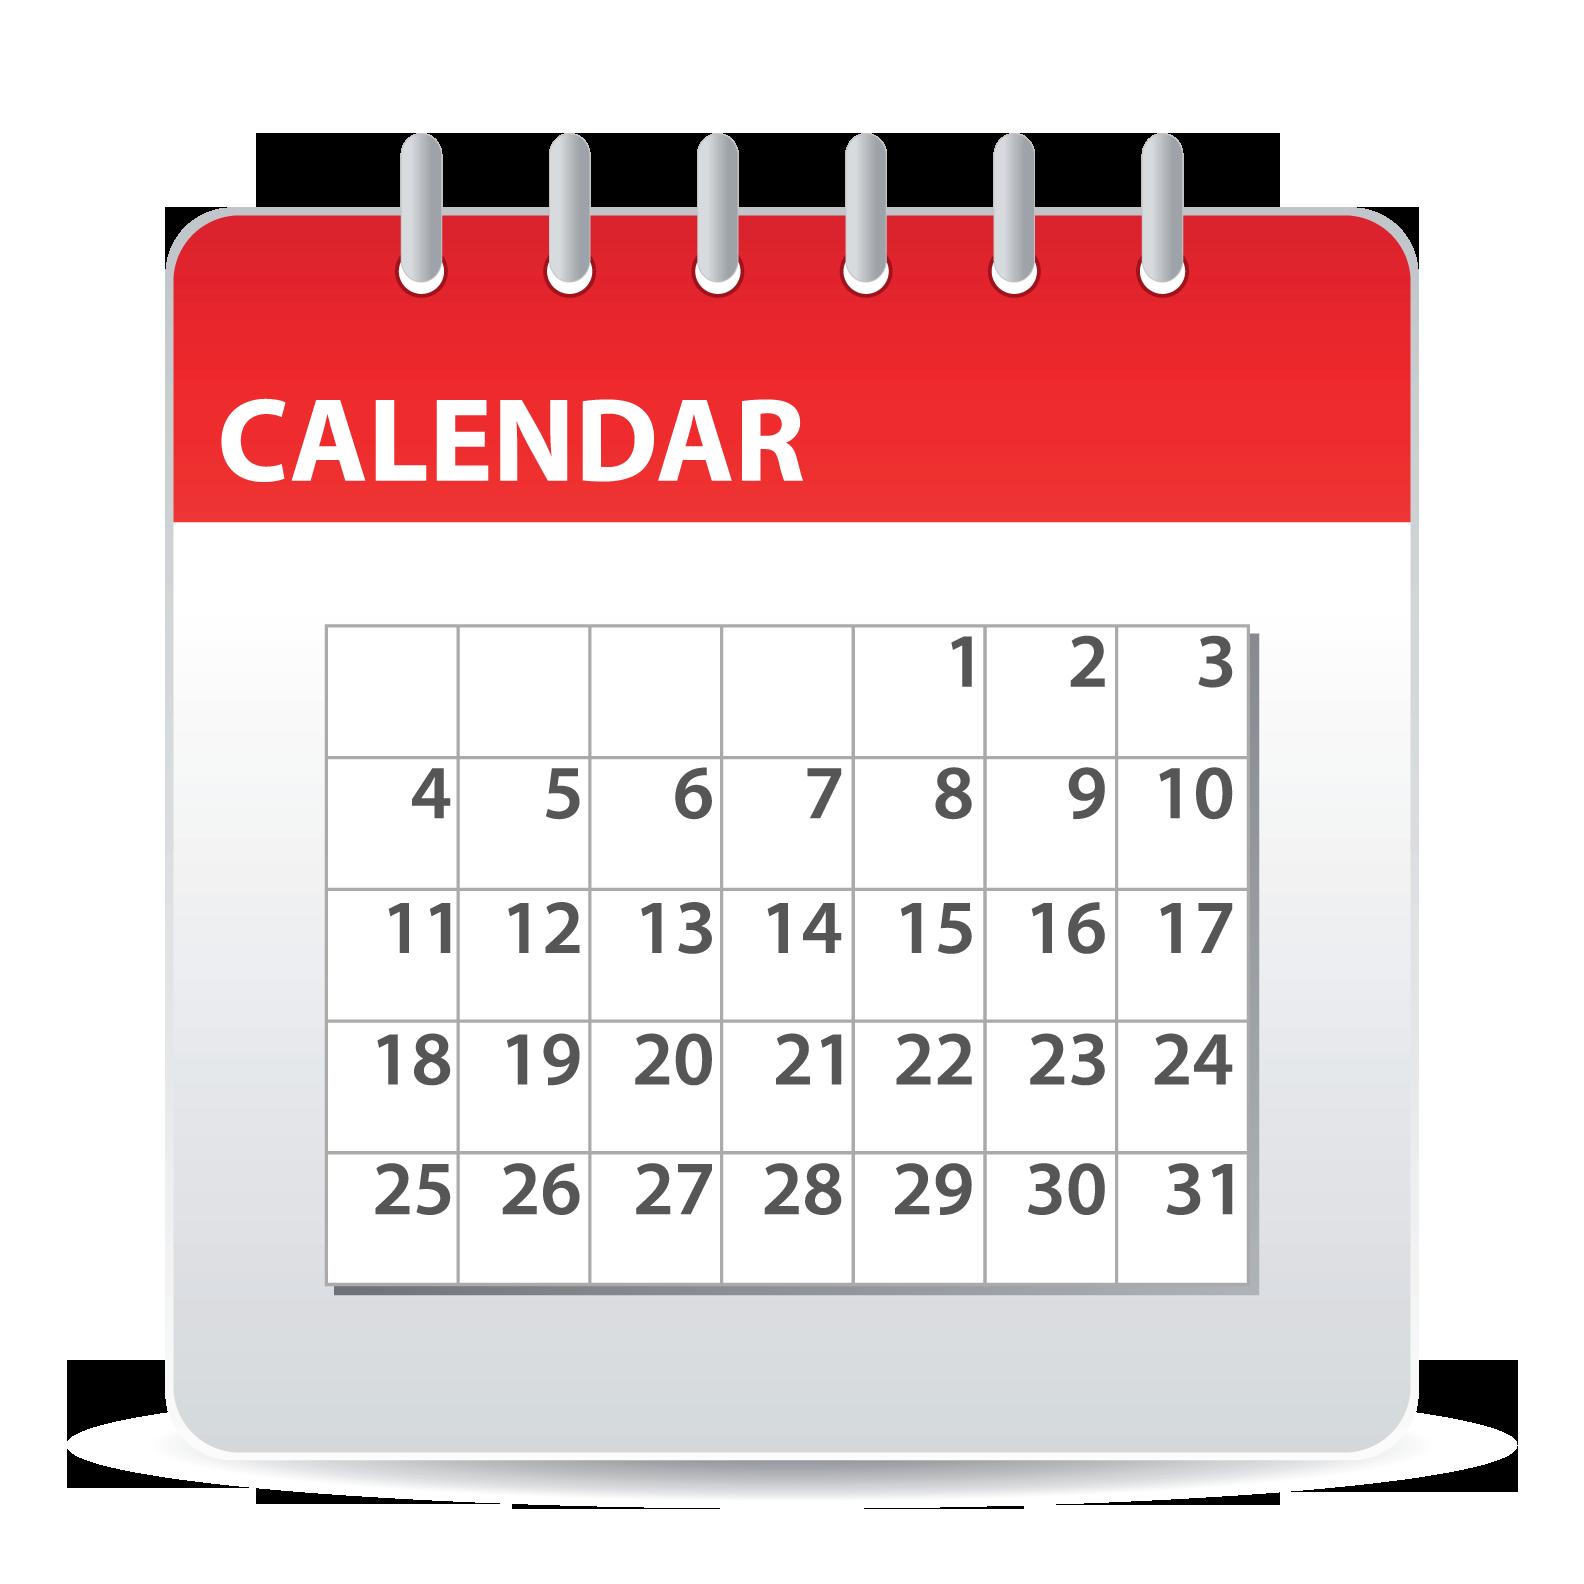 Calendar Png Image - Calendar, Transparent background PNG HD thumbnail